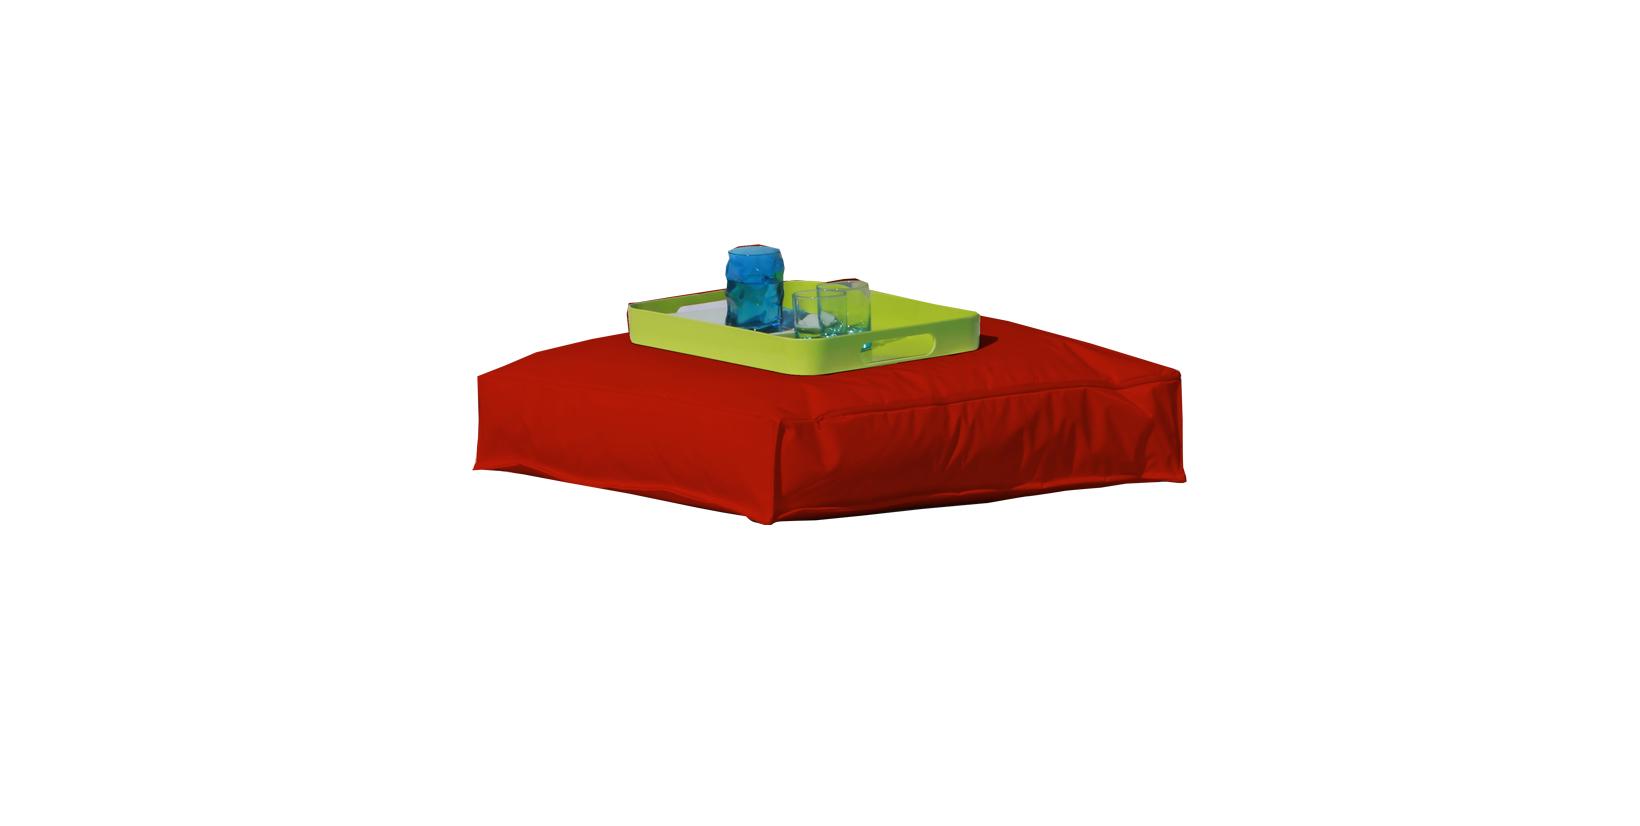 coussin de sol rouge inter exter rouge homemaison. Black Bedroom Furniture Sets. Home Design Ideas